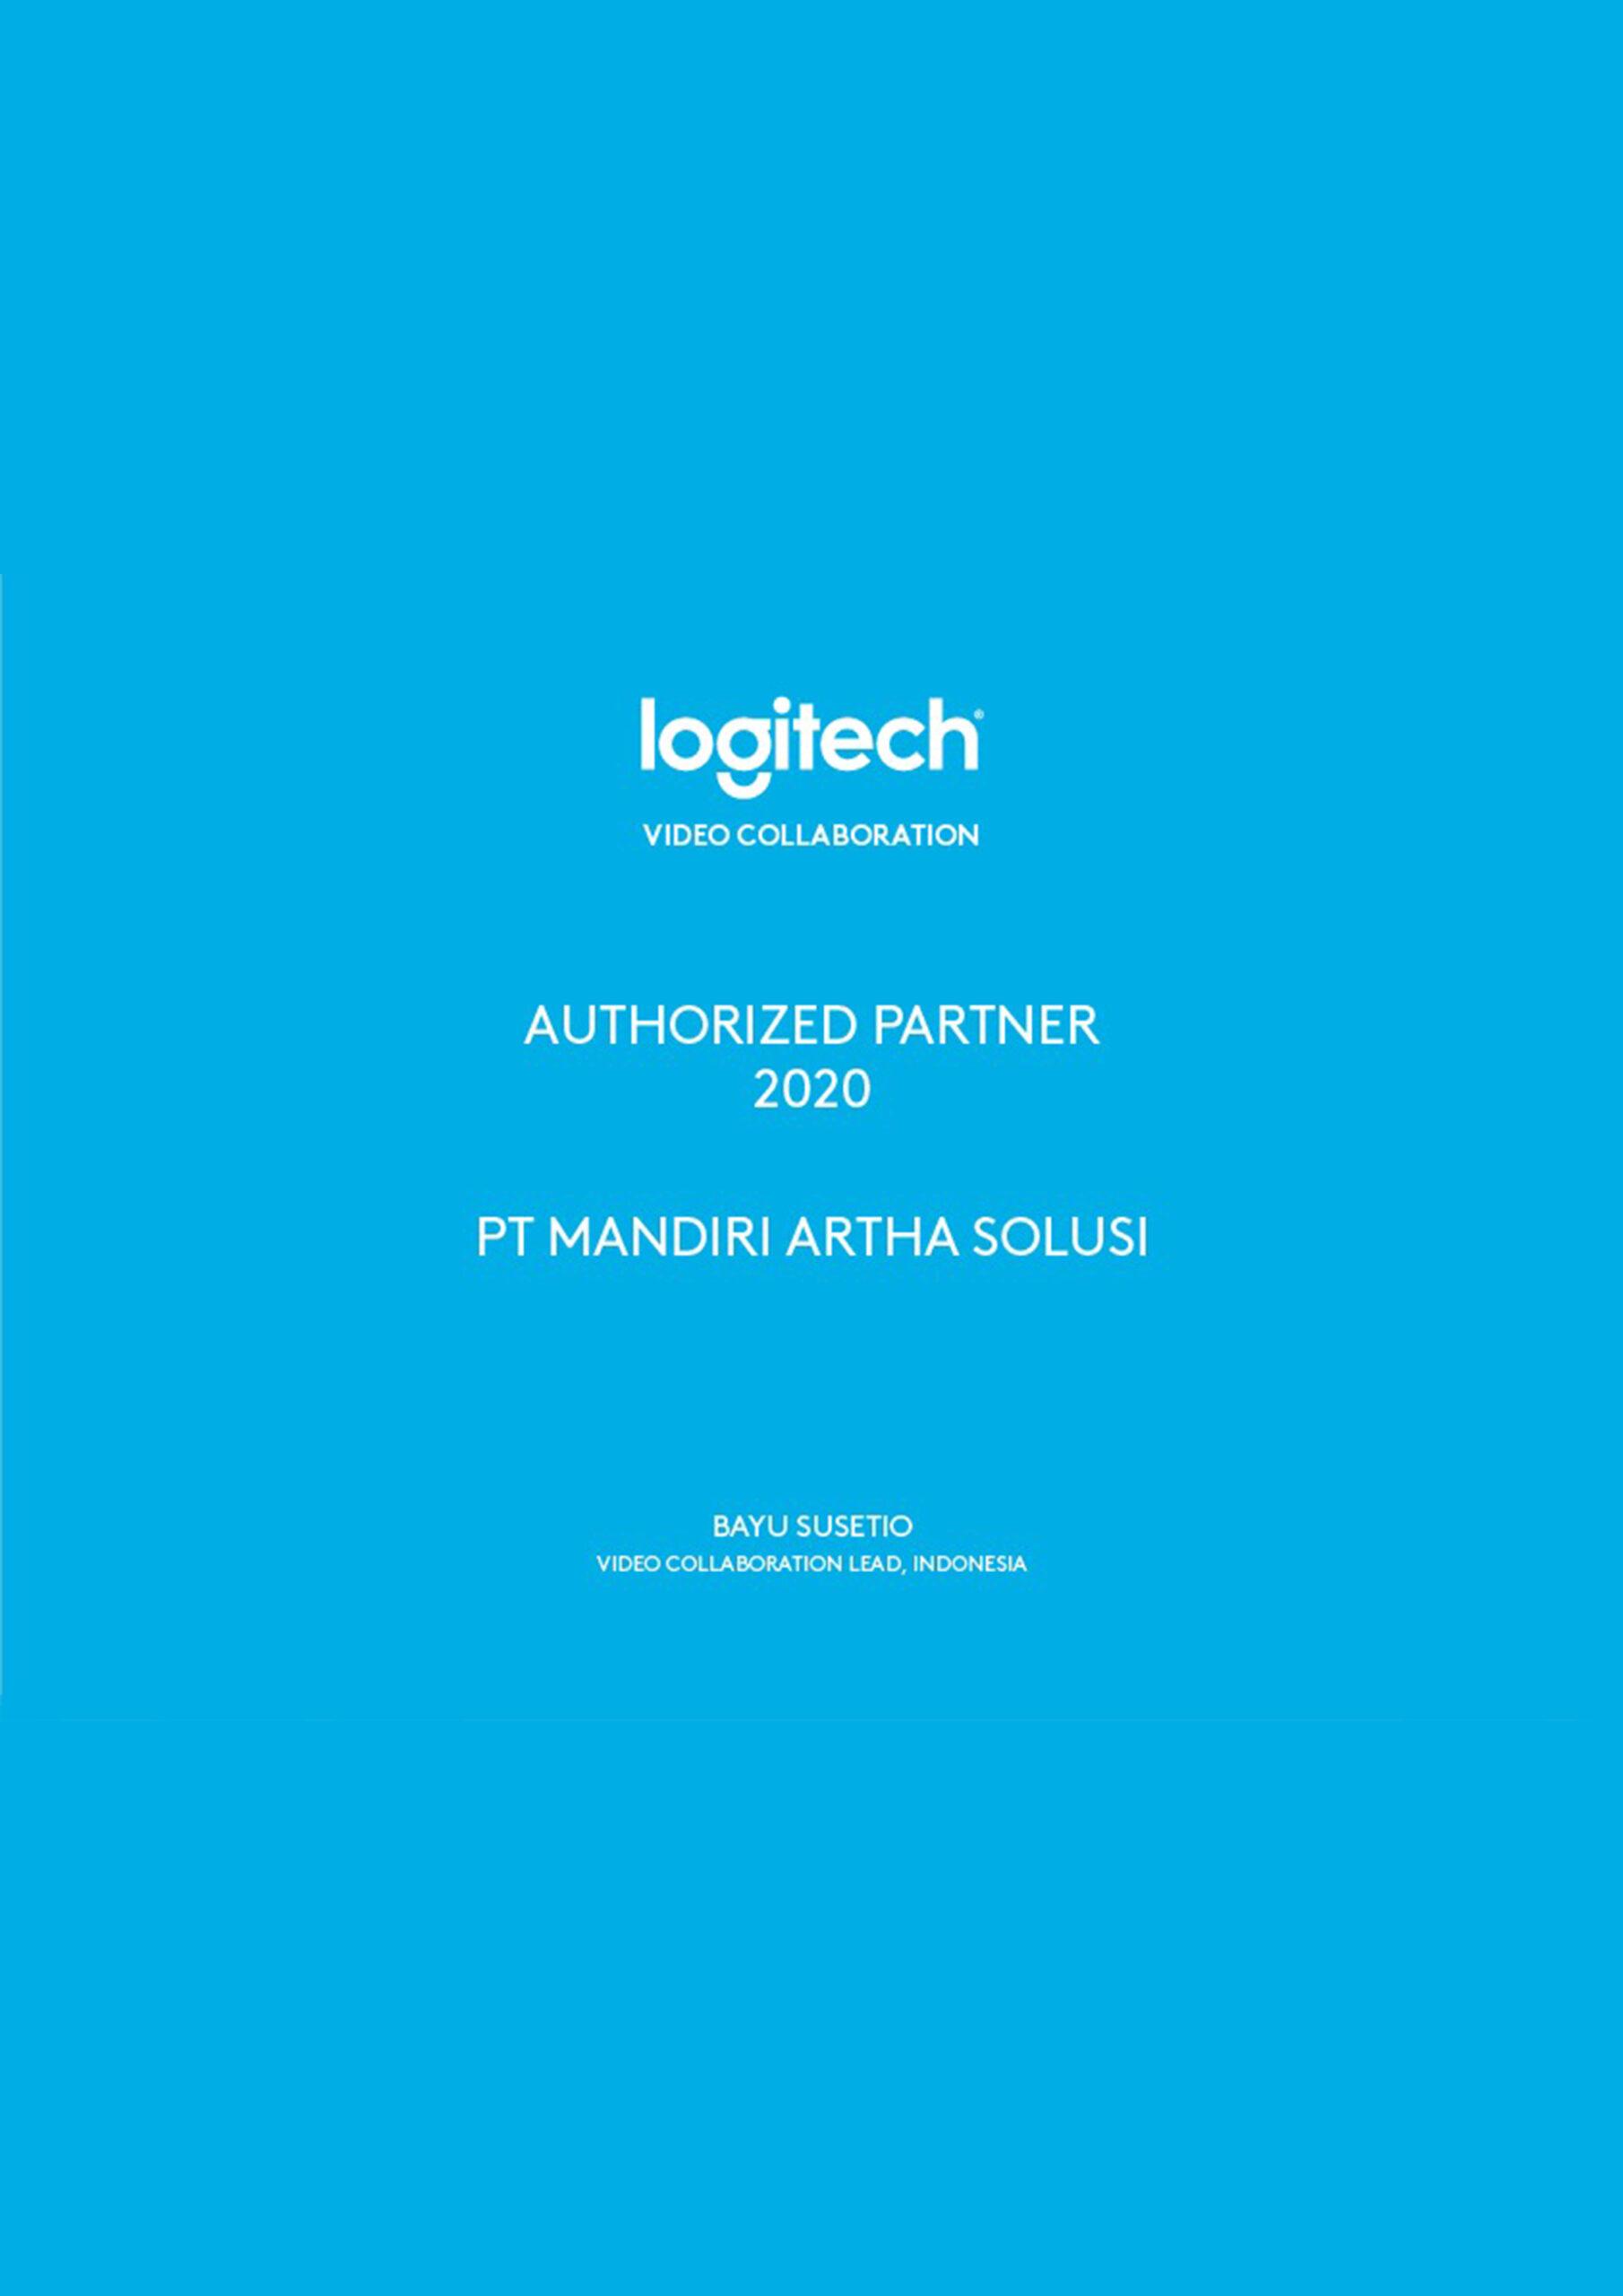 Surat Keterangan Partner Logitech